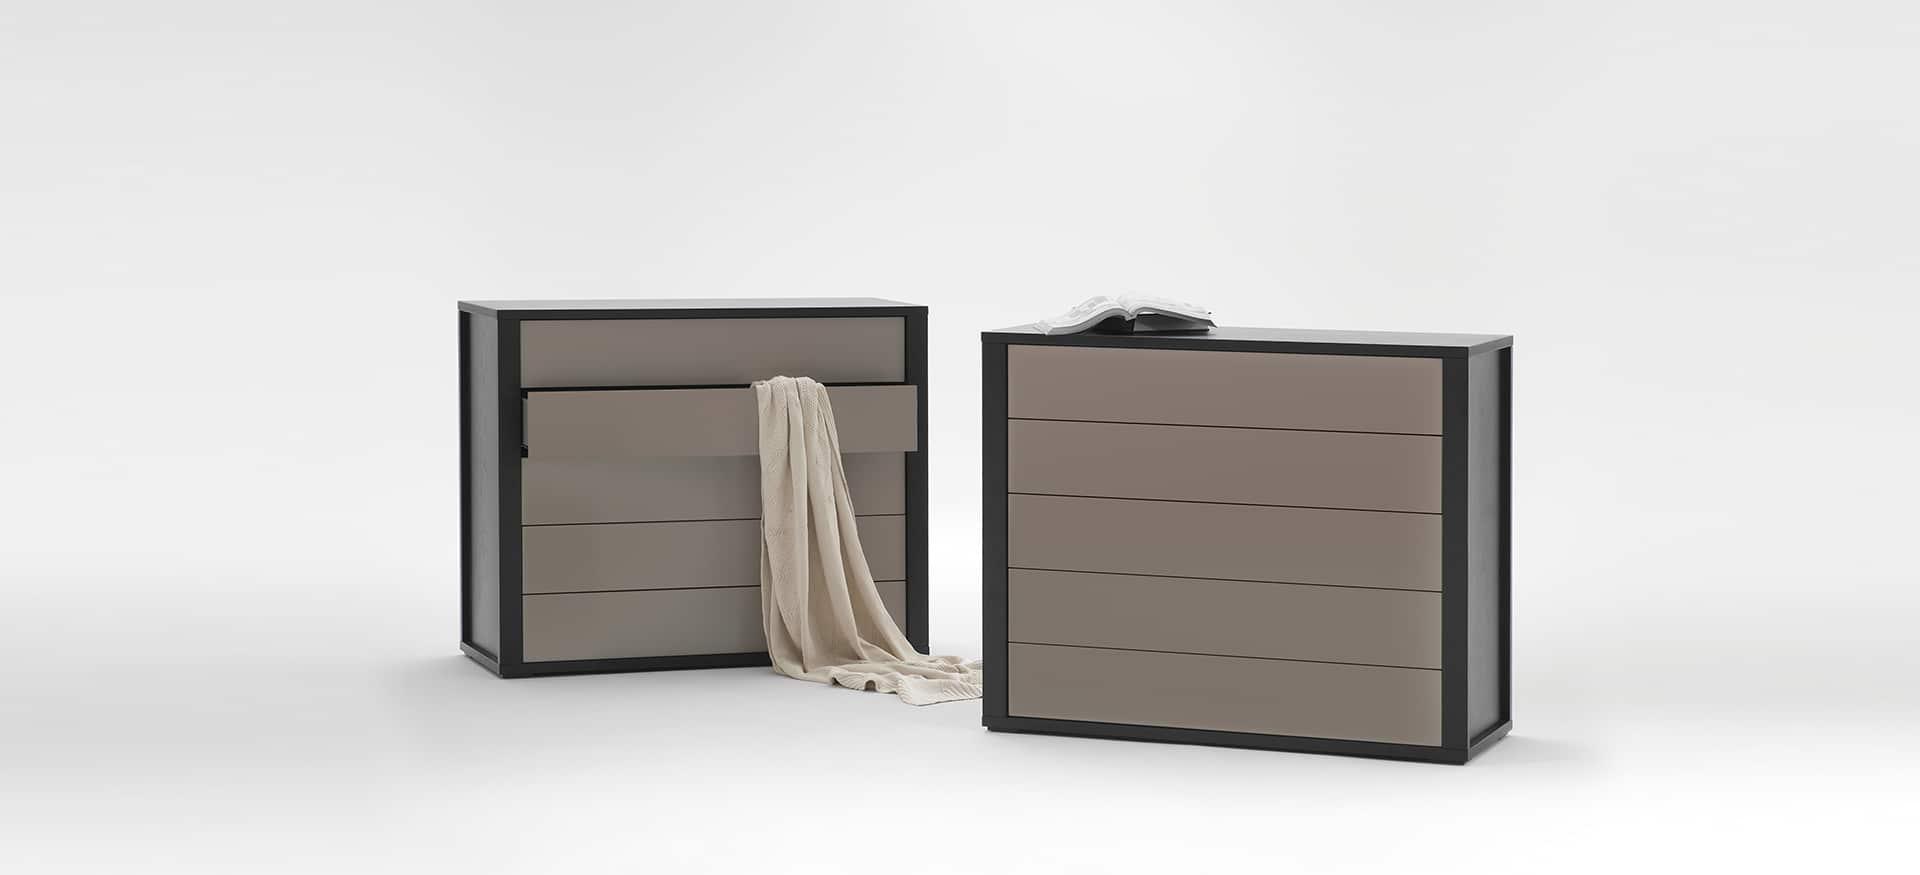 Stilts Cabinet